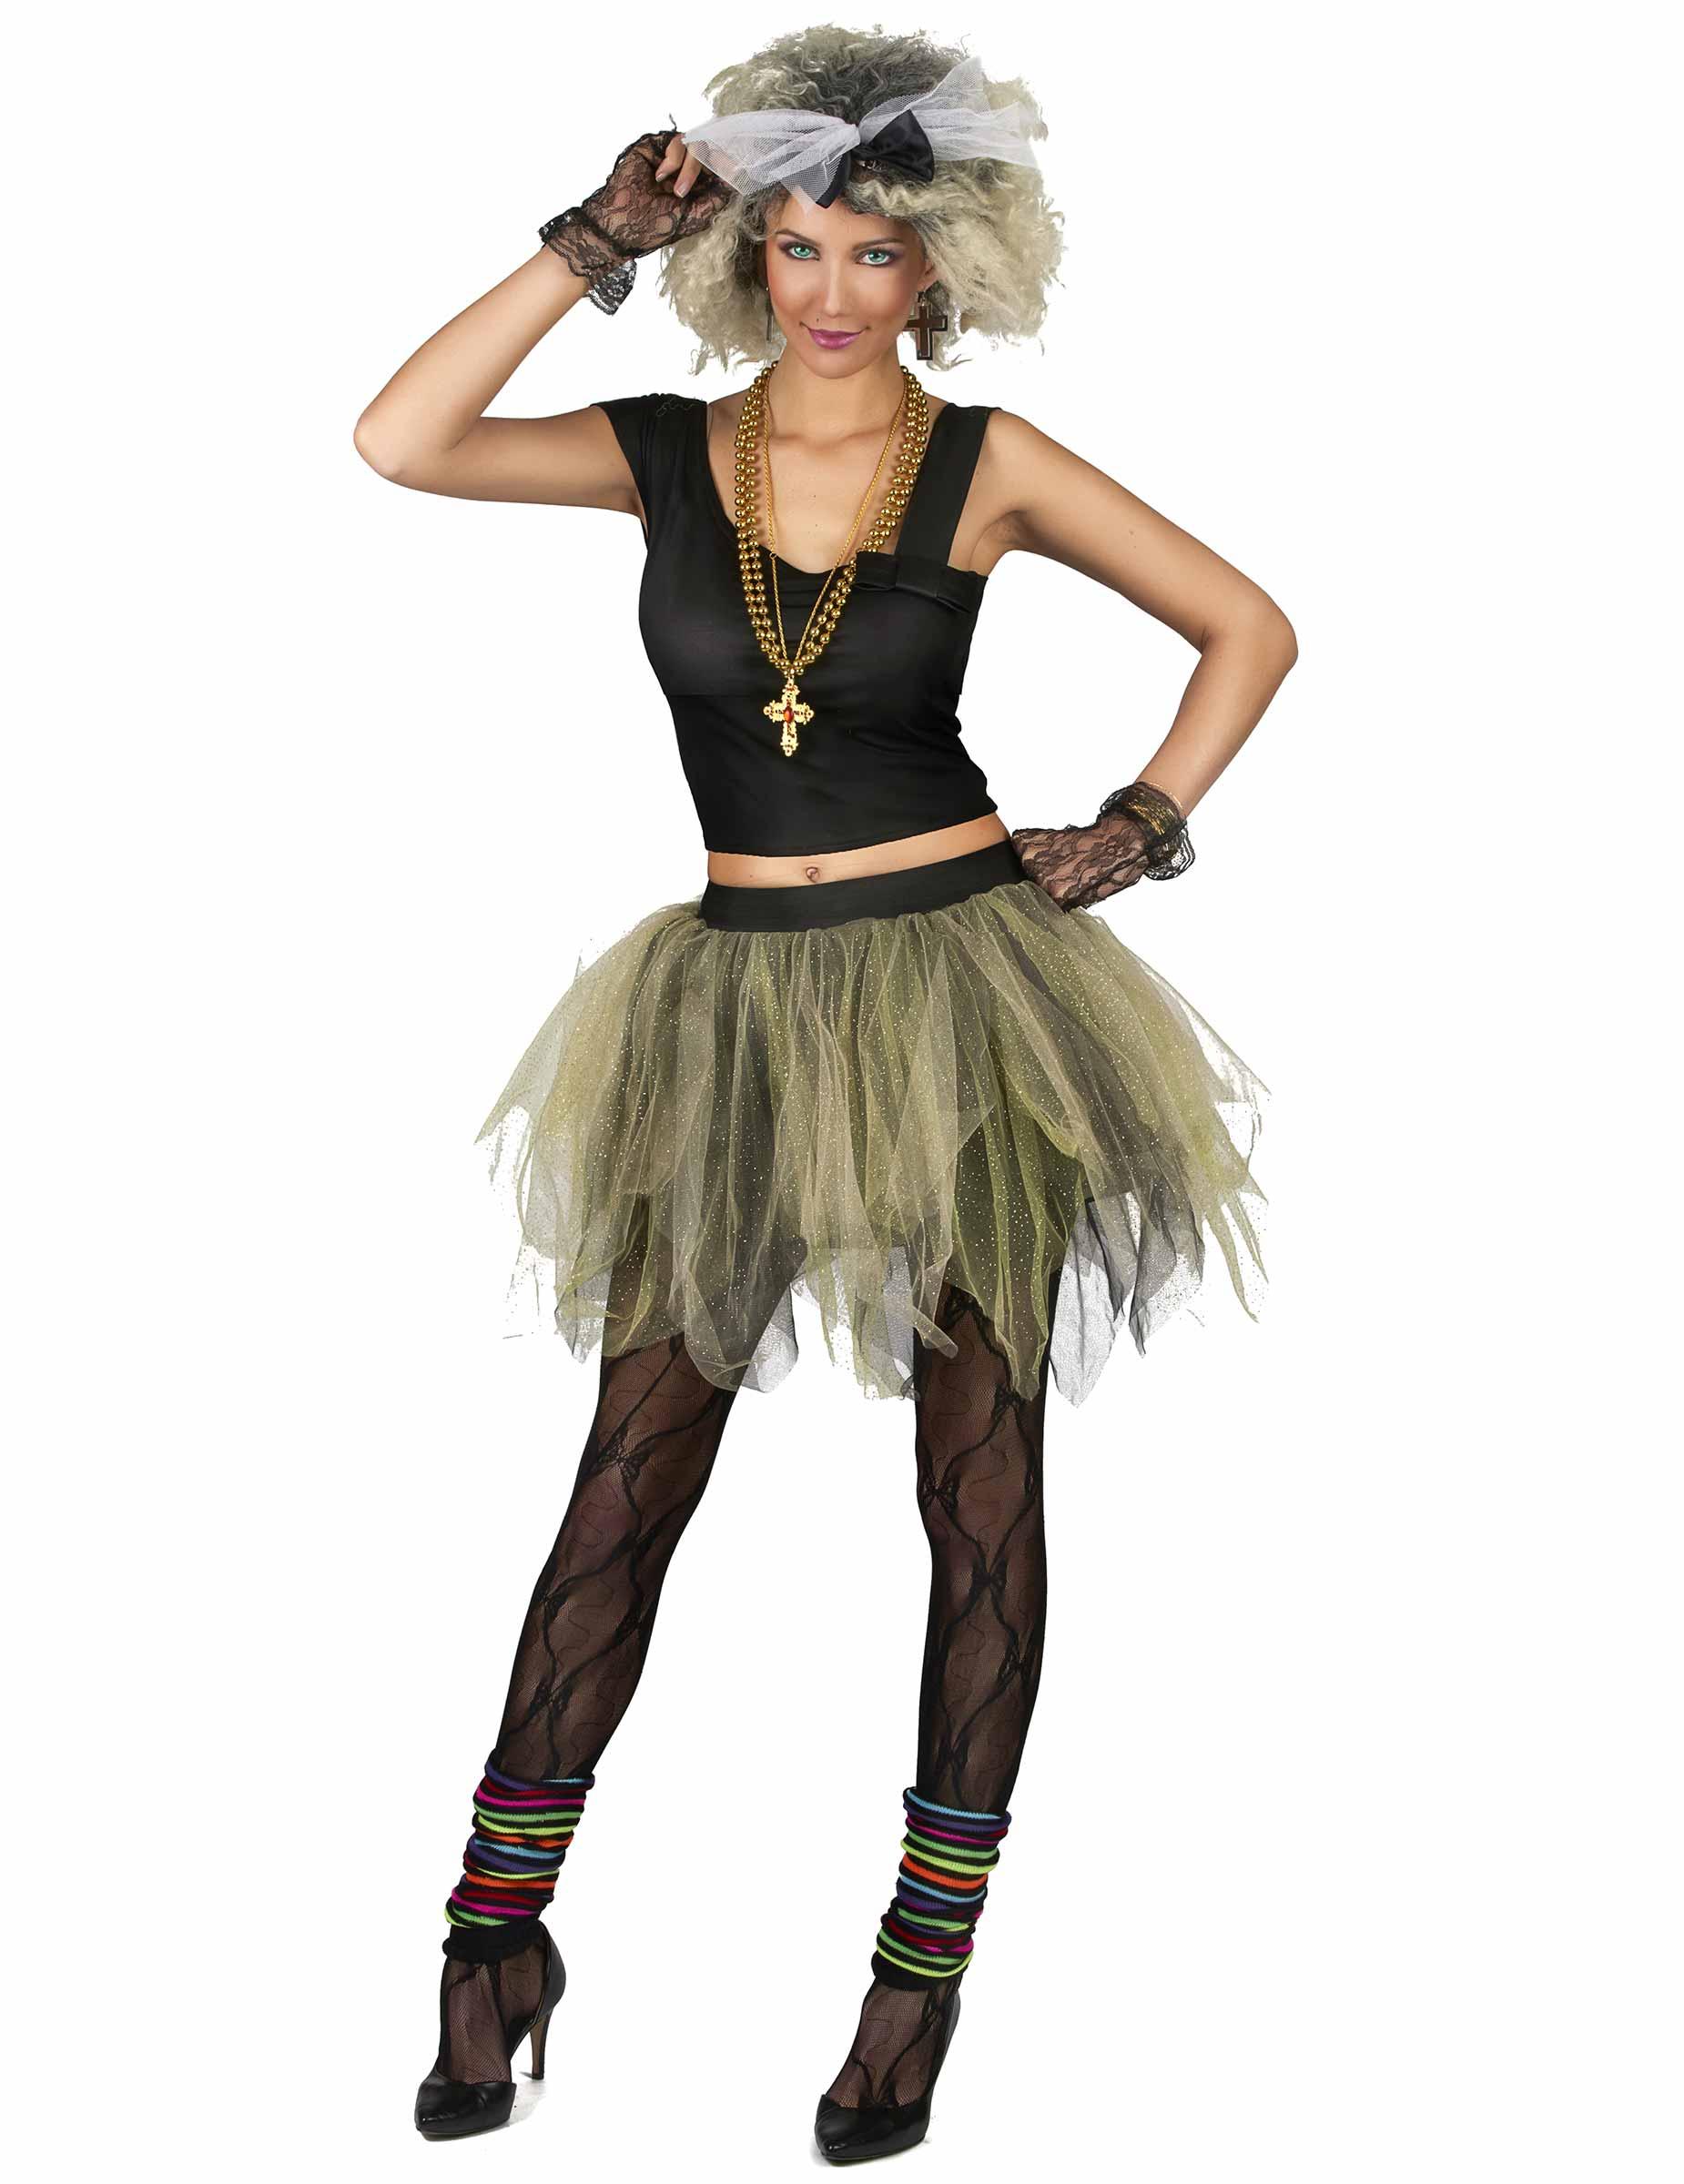 ddc1a2ccc9ff4 80er Disco Popstar Kostüm für Damen